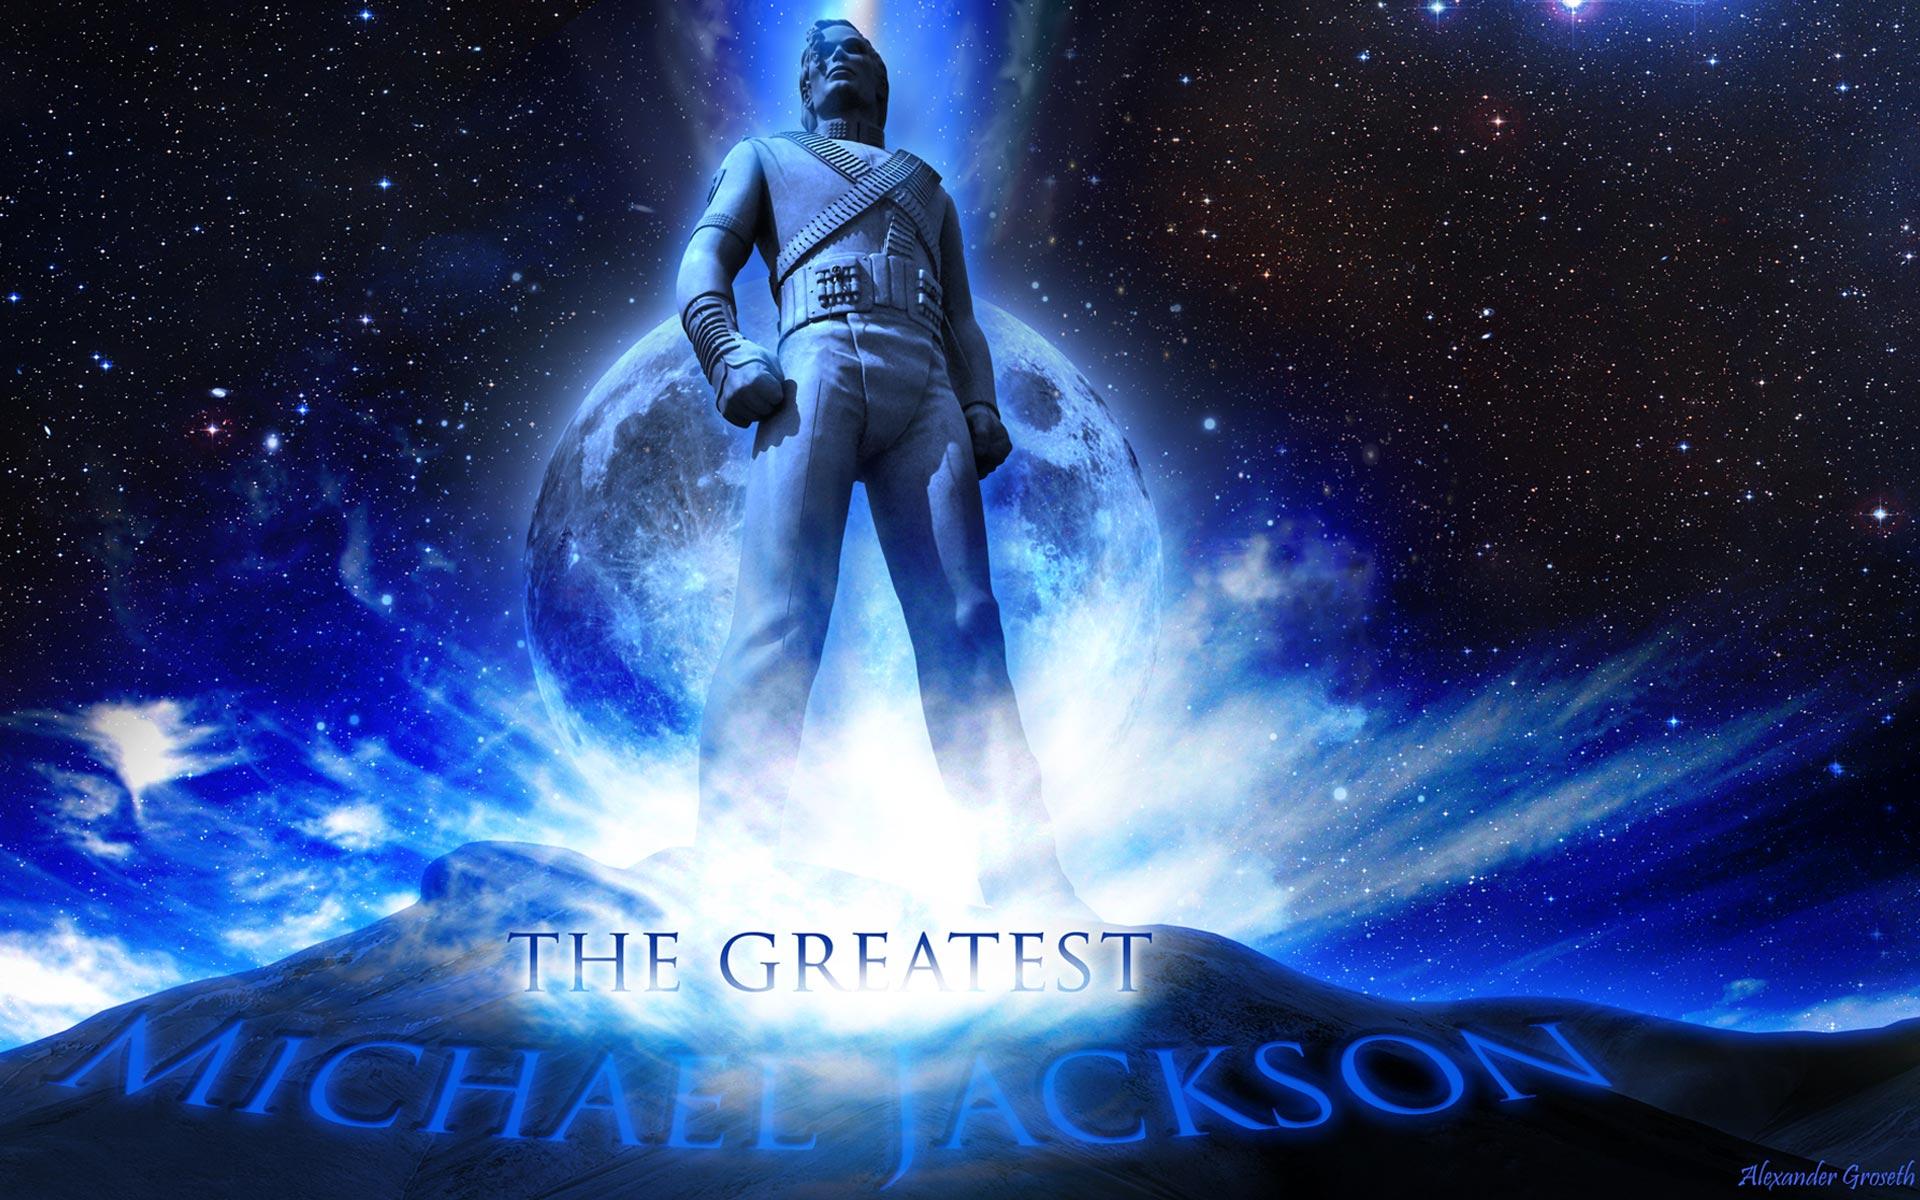 Rick And Morty 3d Wallpaper Michael Jackson Wallpapers Hd A35 Hd Desktop Wallpapers